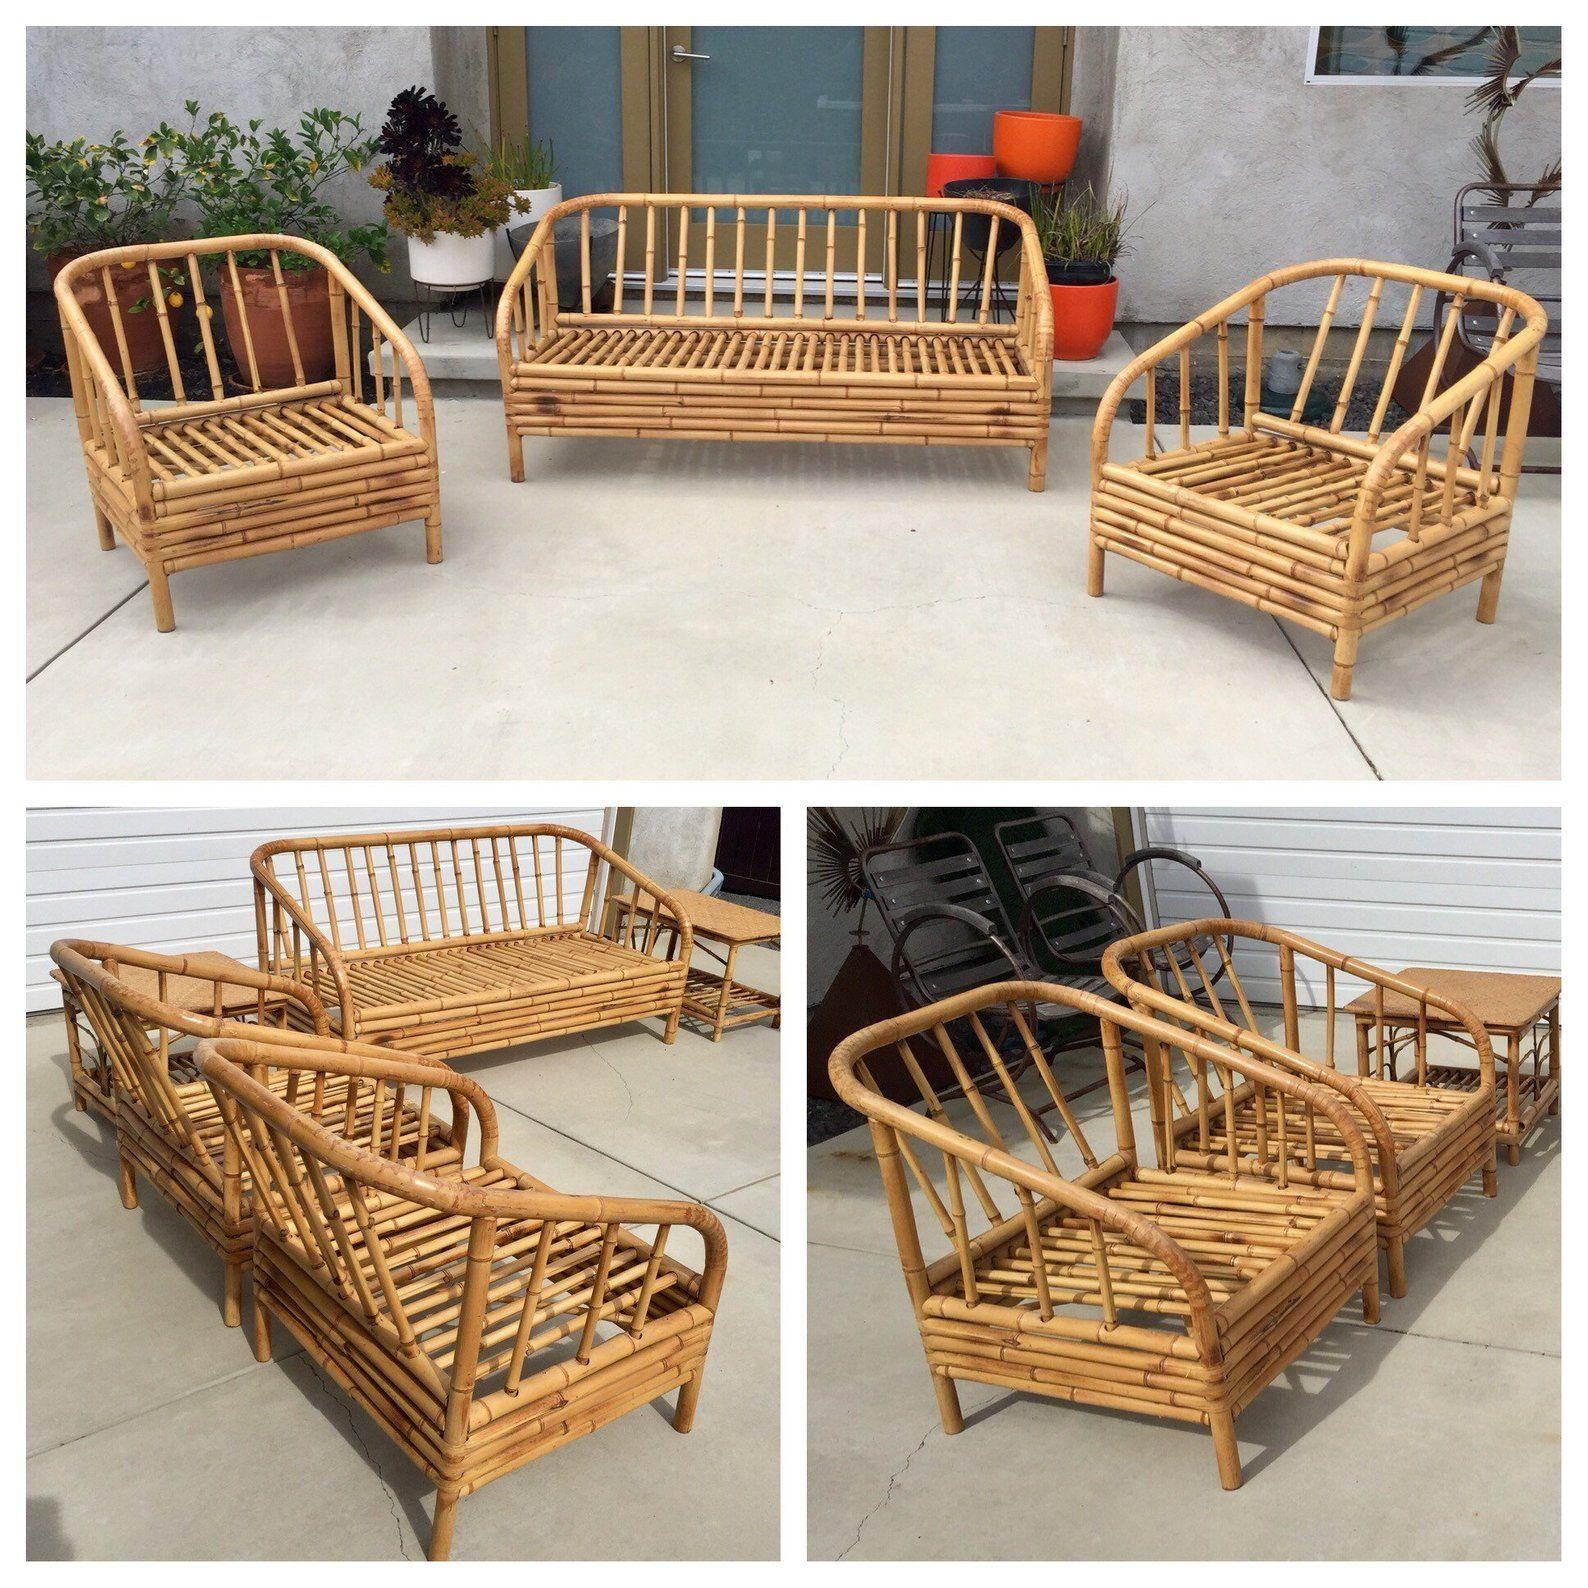 Bamboo Sofa Chairs Tables Living Area Seating Set 1 Sofa Etsy Bamboo Sofa Bamboo Furniture Outdoor Furniture Sofa Set